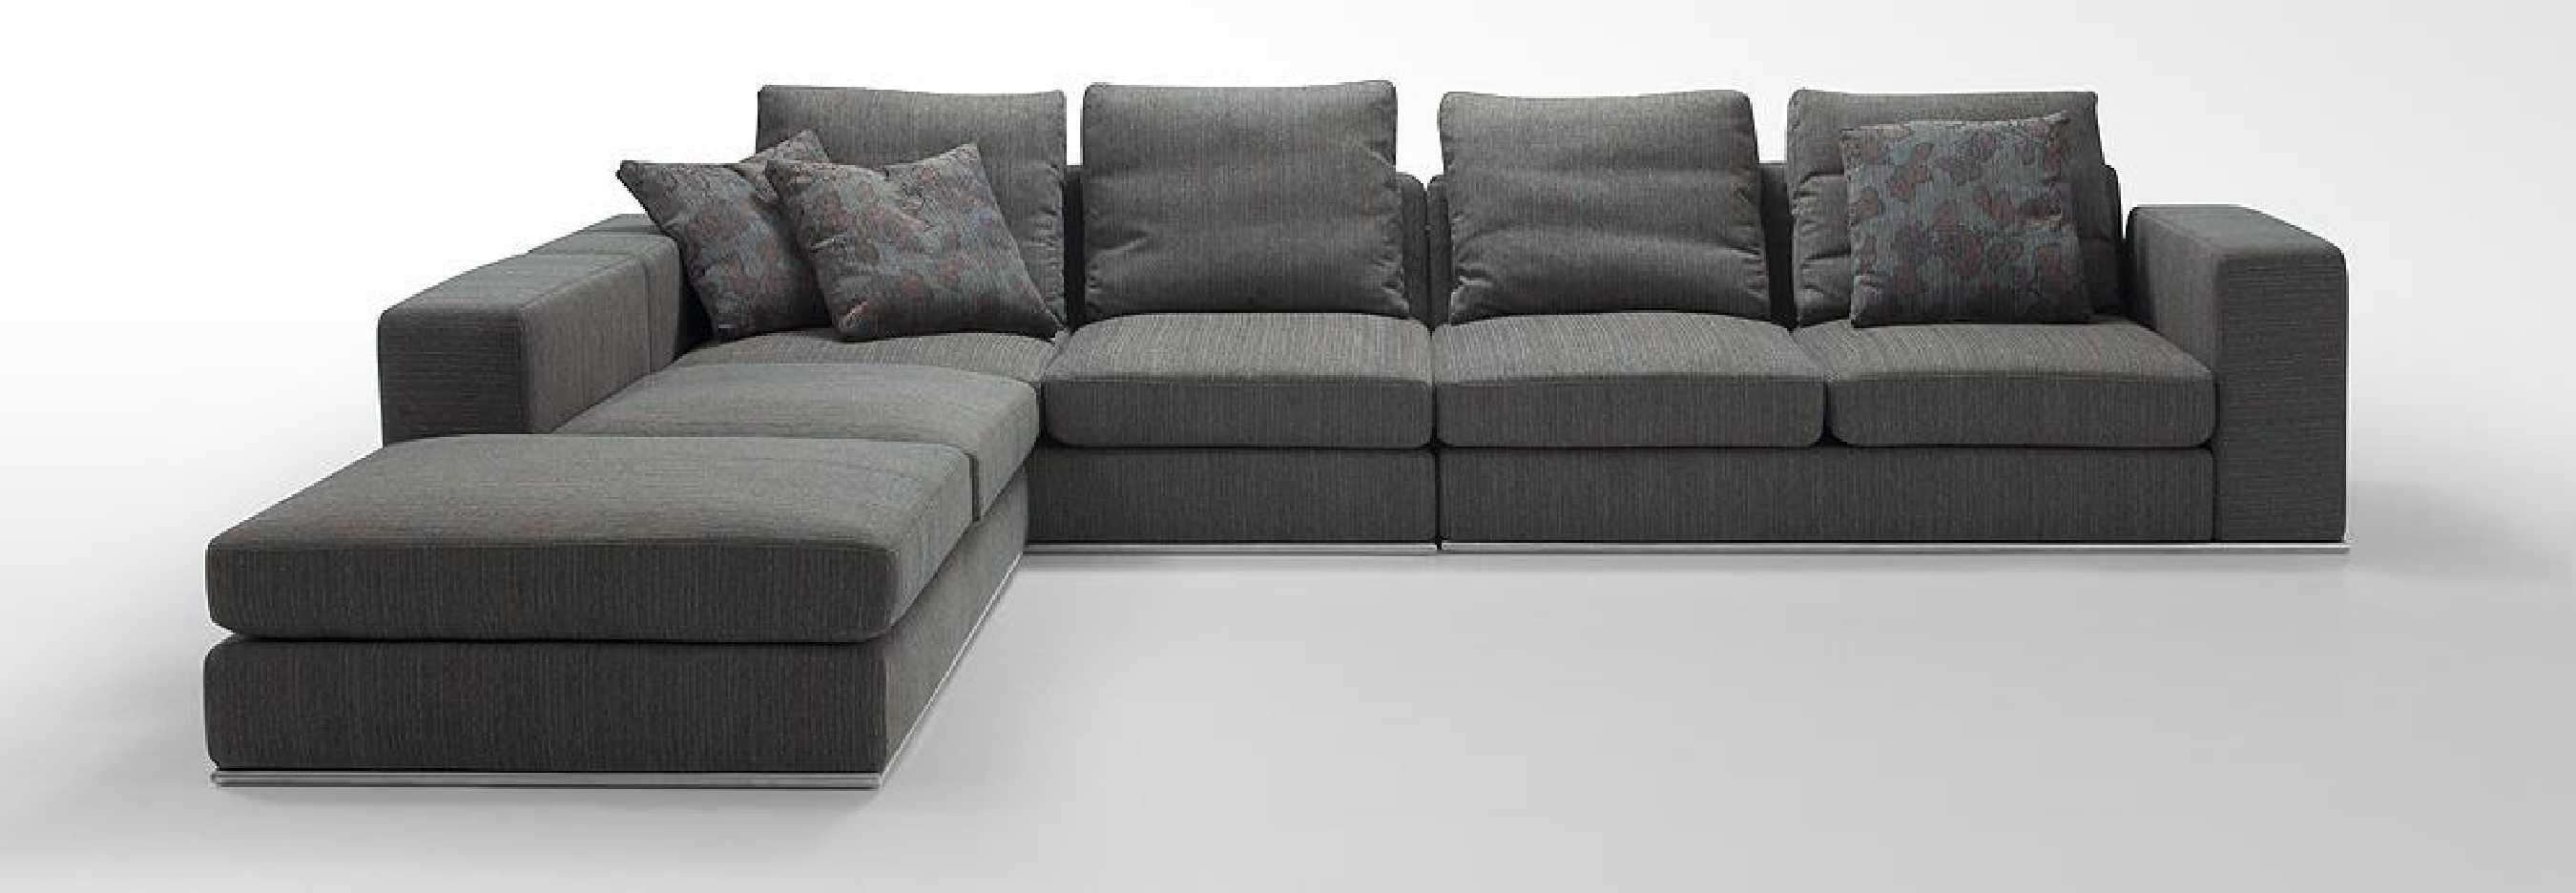 small grey sofa loui modern outdoor tosh furniture gray set 20 best sofas ideas